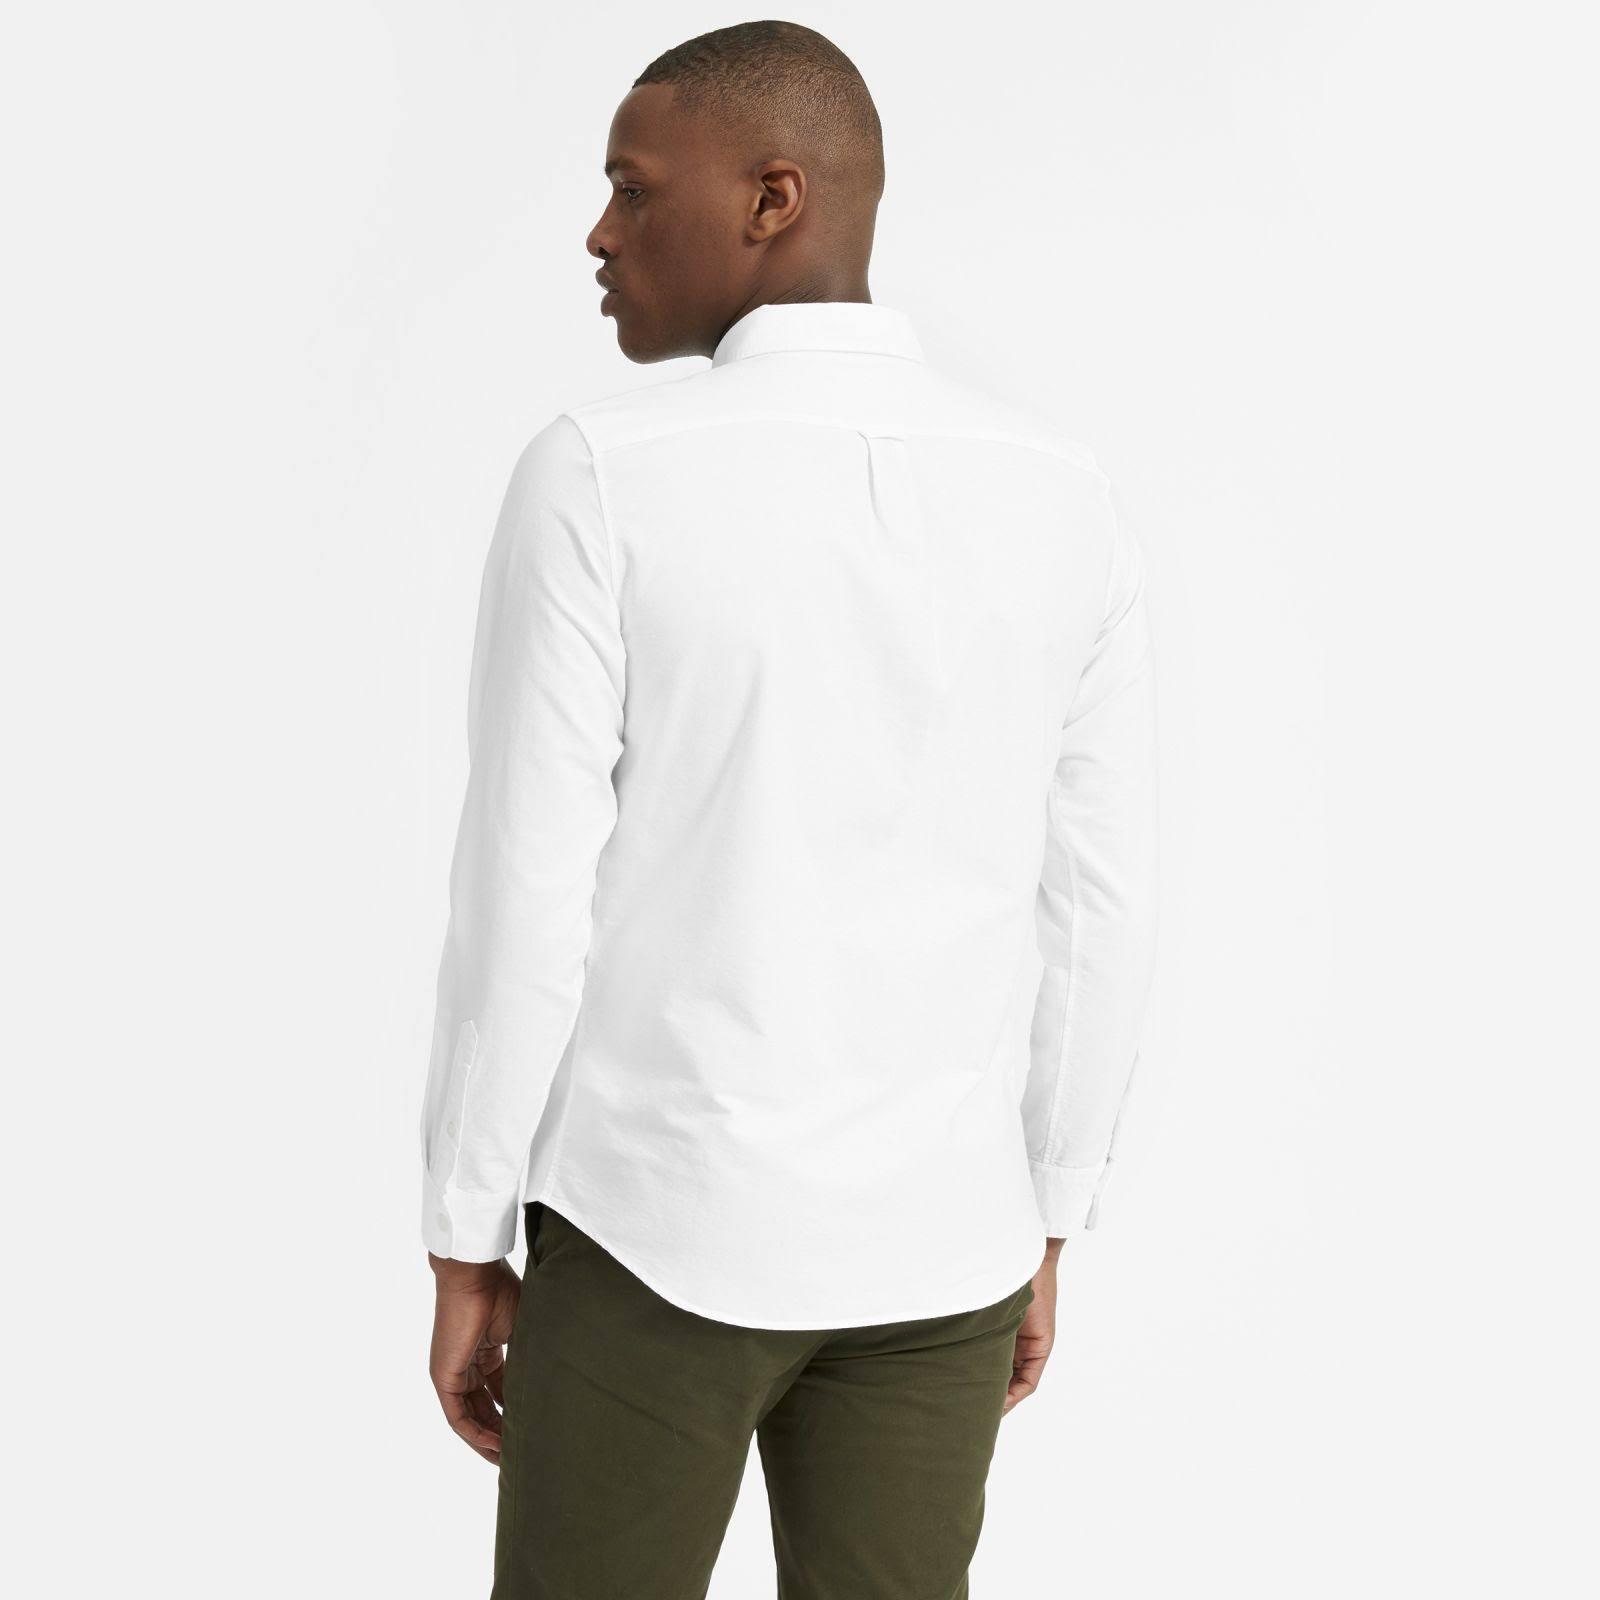 Japonesa Hombre Xs Blanco Talla En Oxford Para Camisa Fit Slim Everlane De q7wtUXcTH